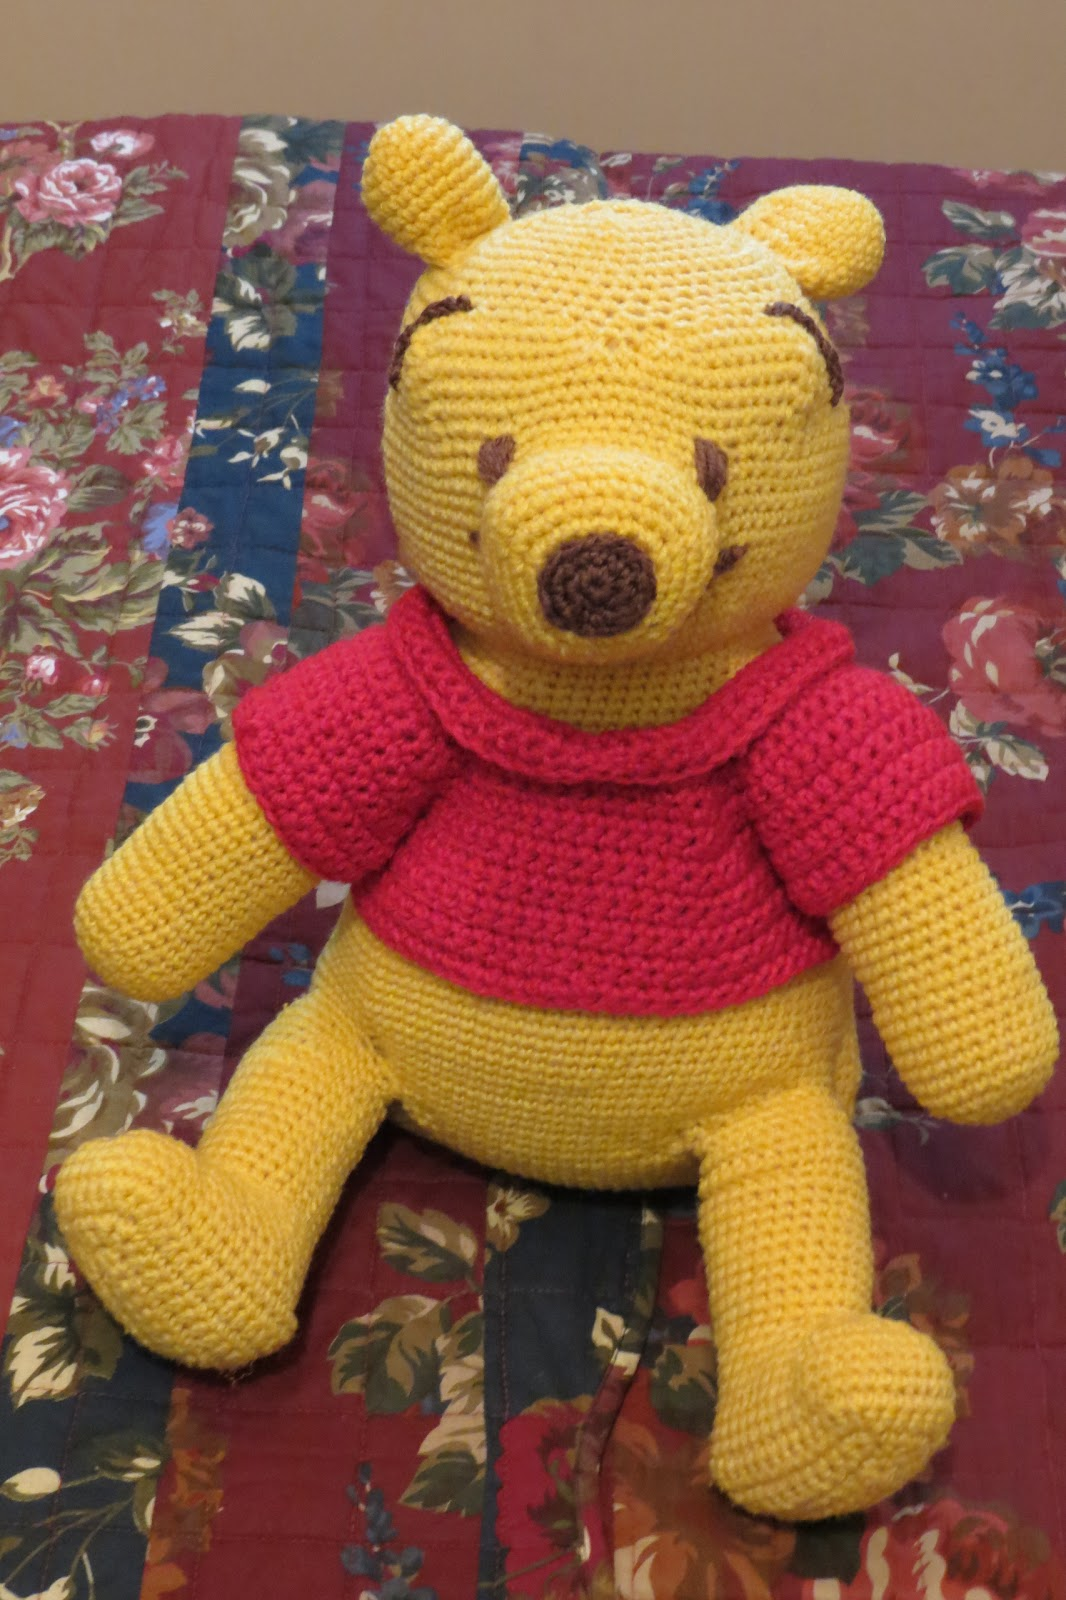 Amigurumi Winnie The Pooh : Crochet Amigurumi Winnie The Pooh manal311